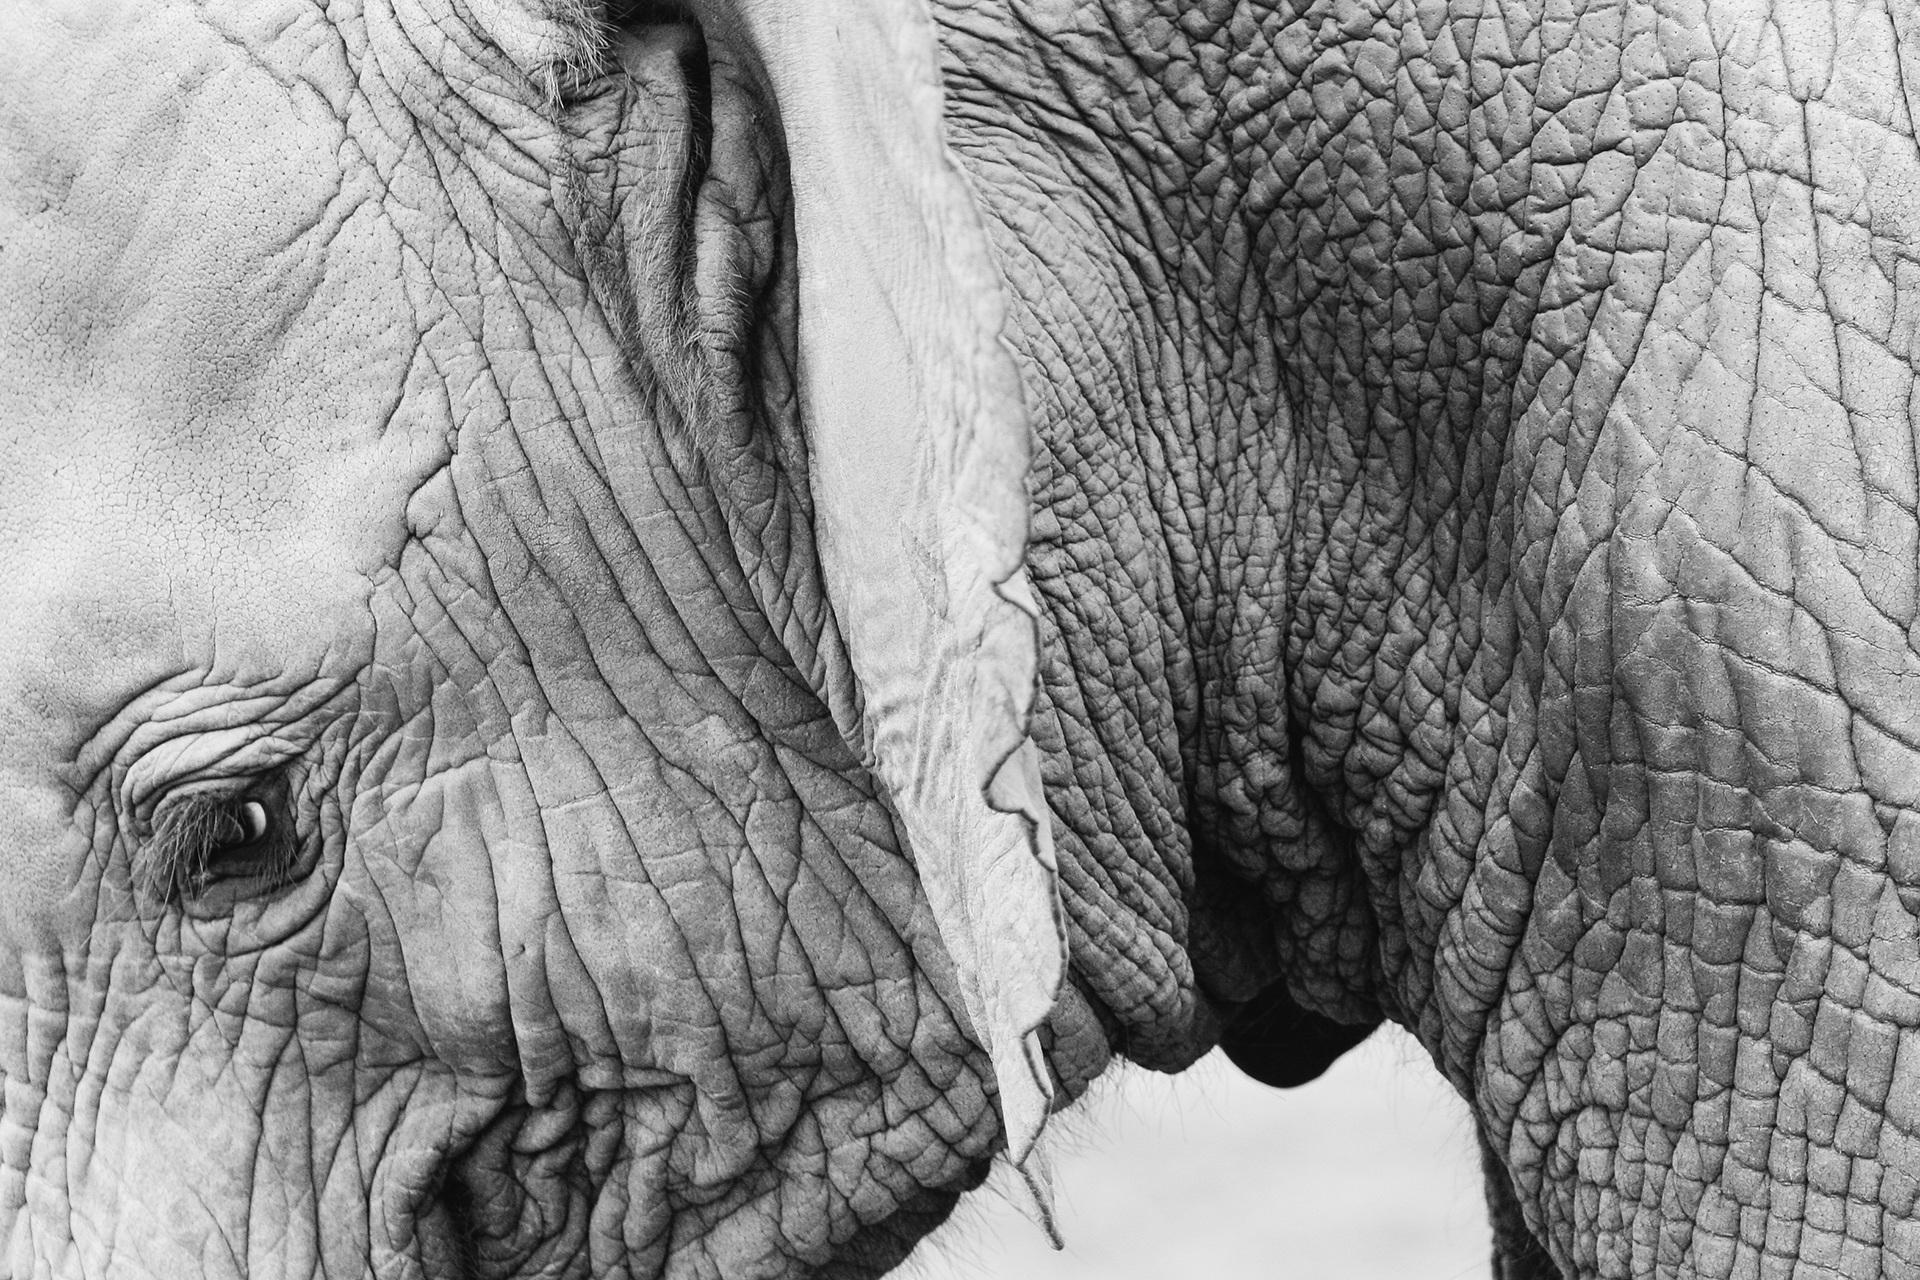 Elephant 820147